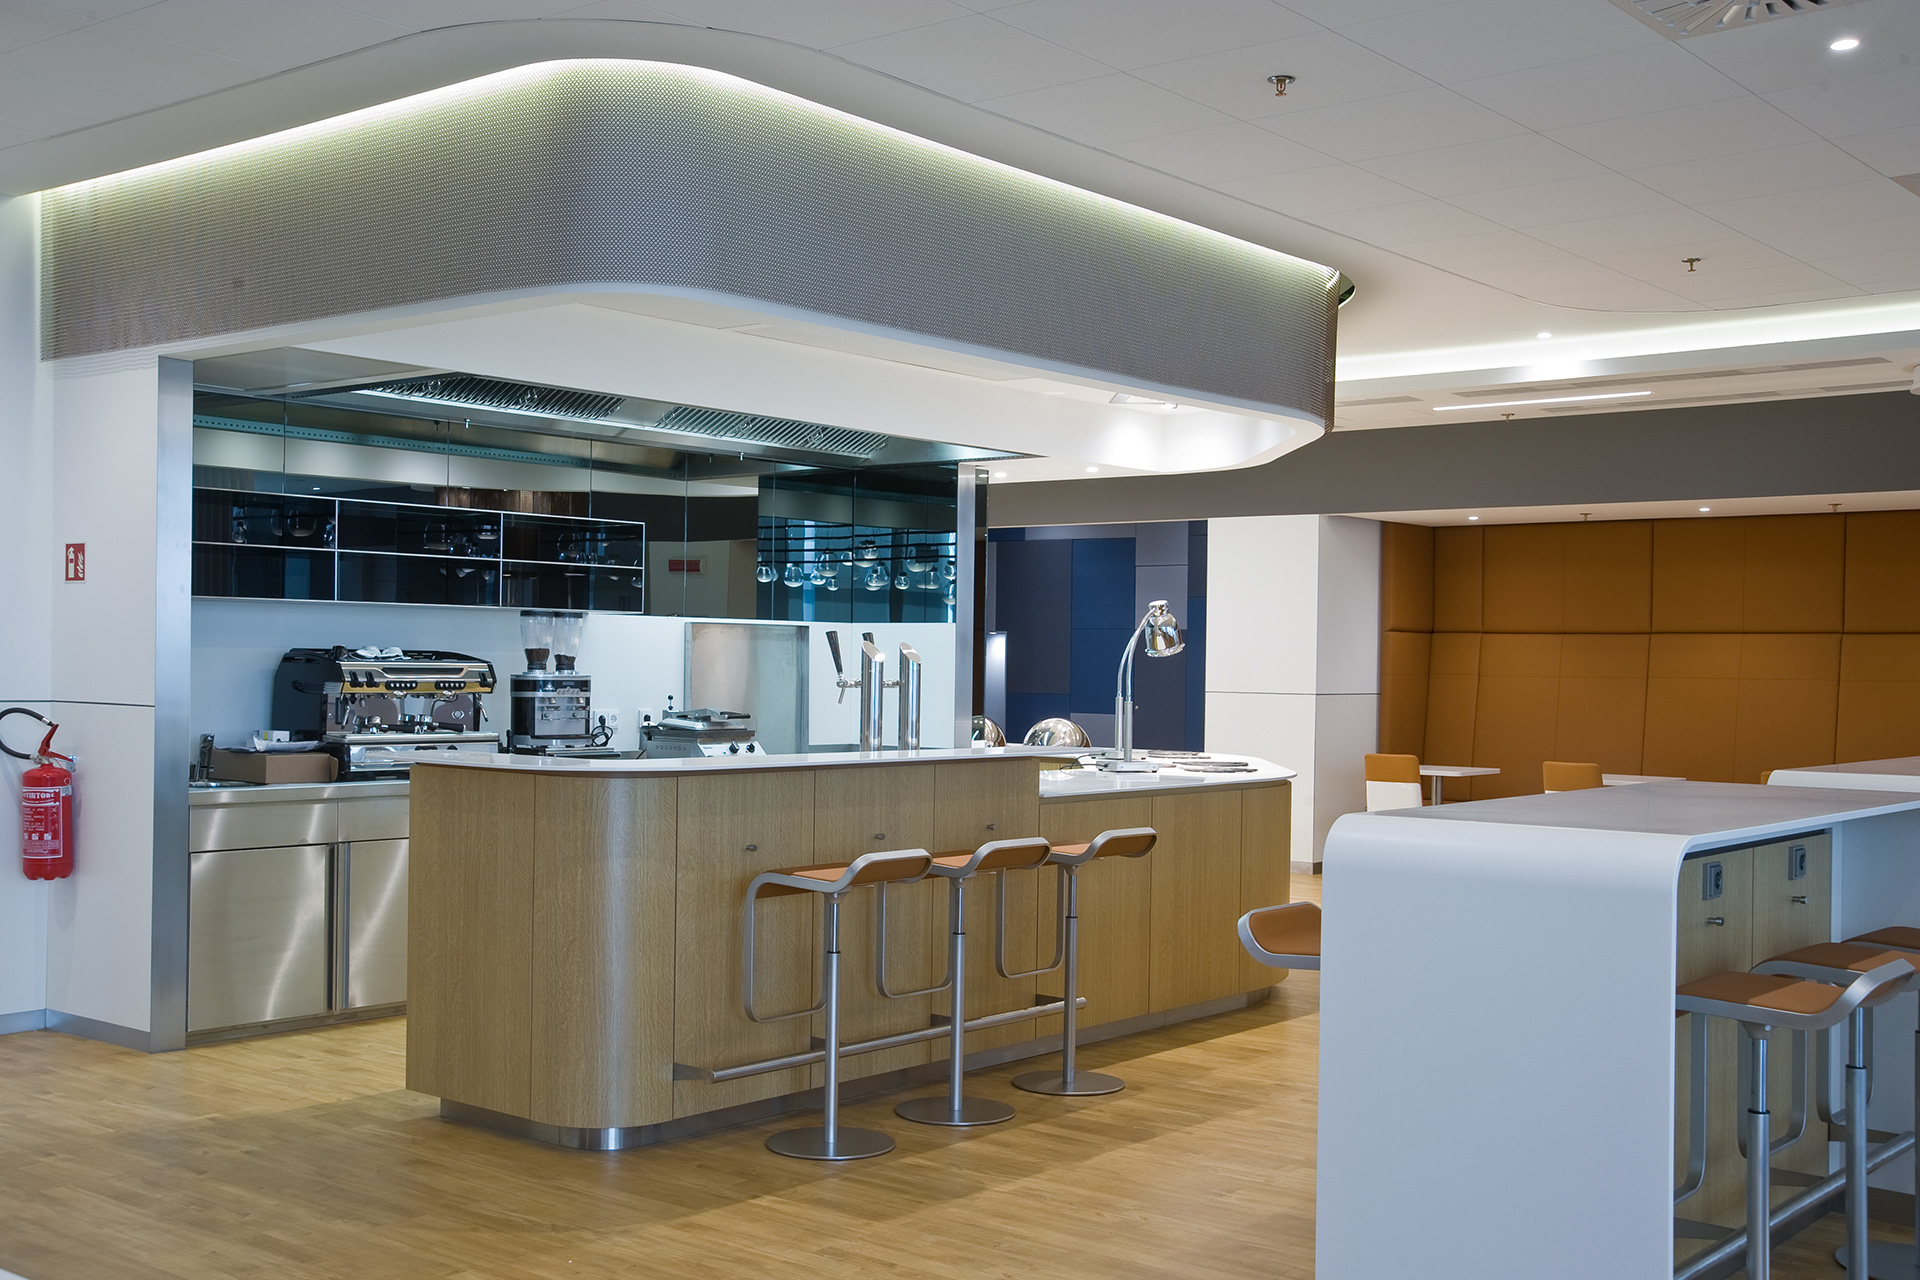 18-C-Lufthansa-Lounge-Malpensa